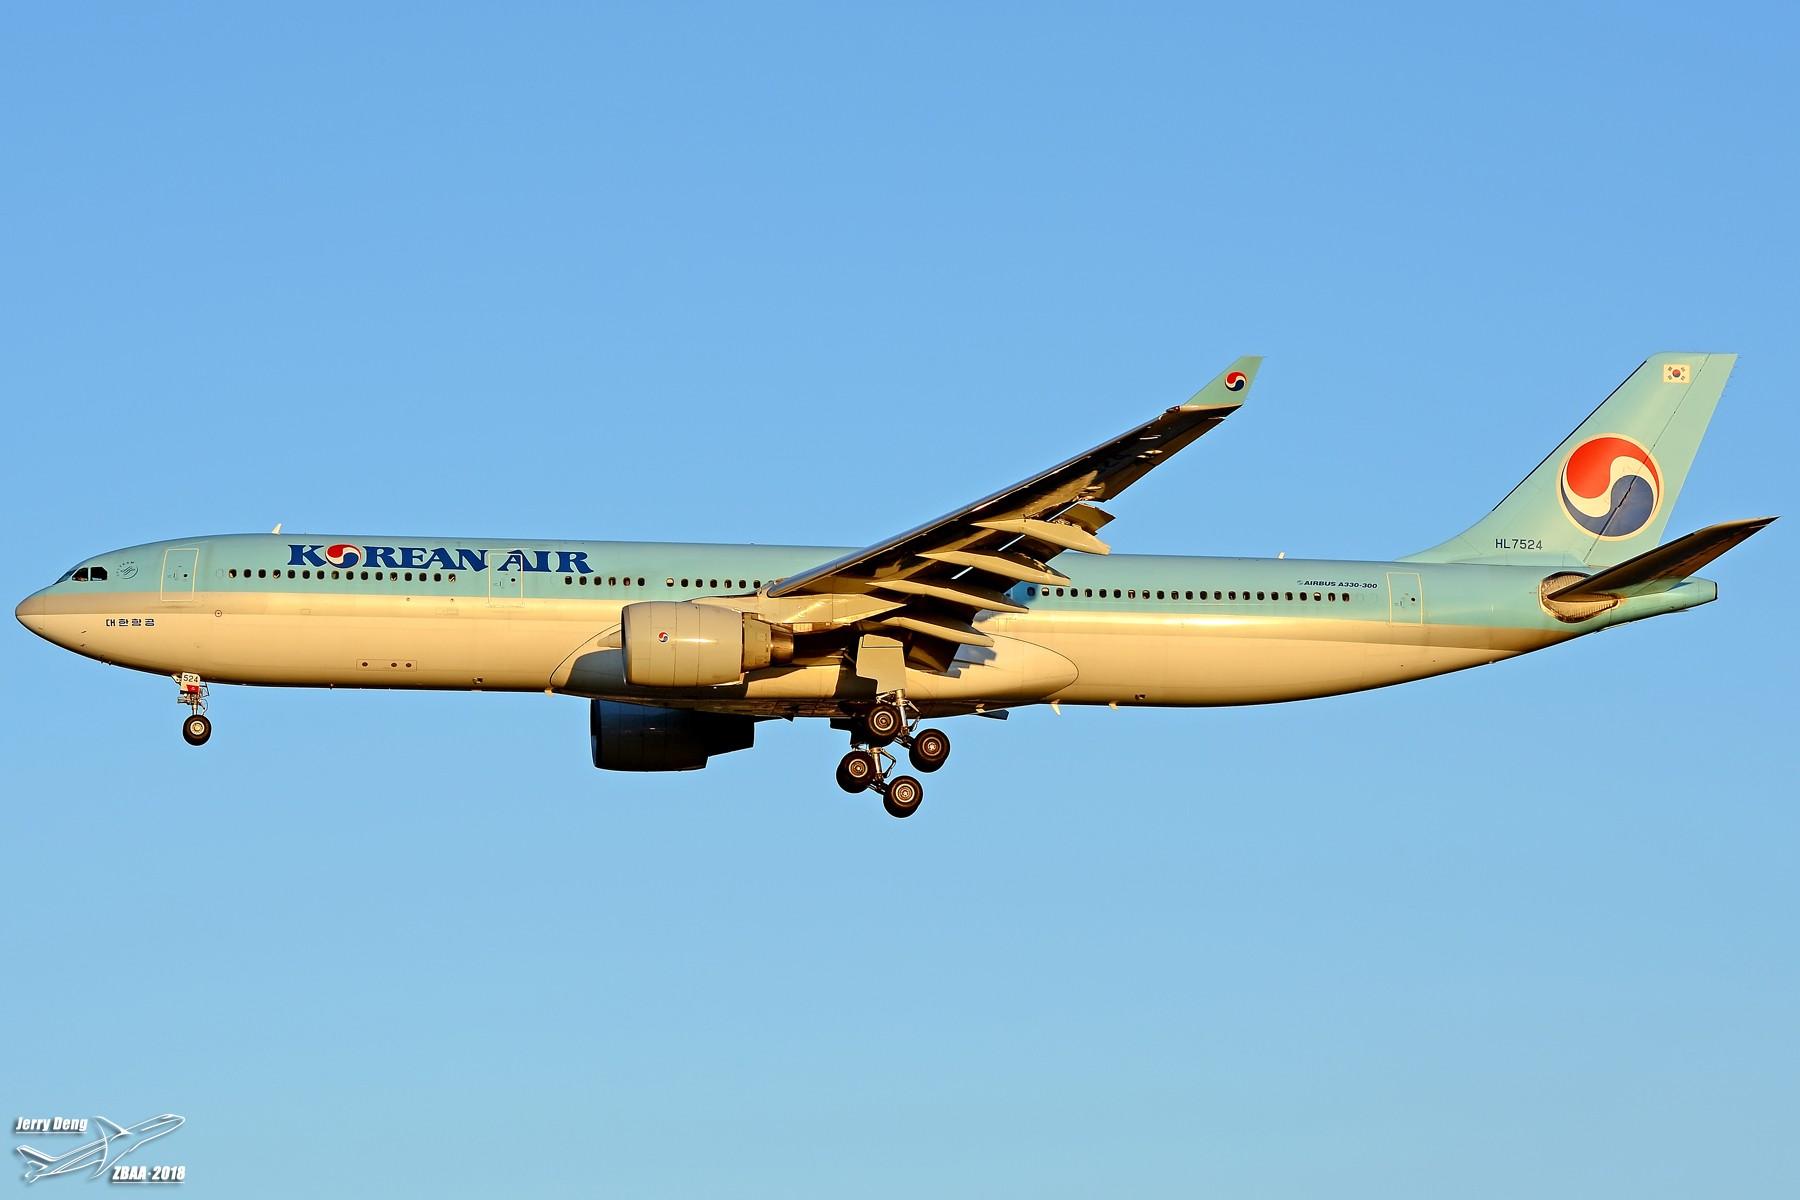 Re:[原创]【多图党】出差赶上天气不错ZBAA随拍 AIRBUS A330-300 HL7524 中国北京首都国际机场